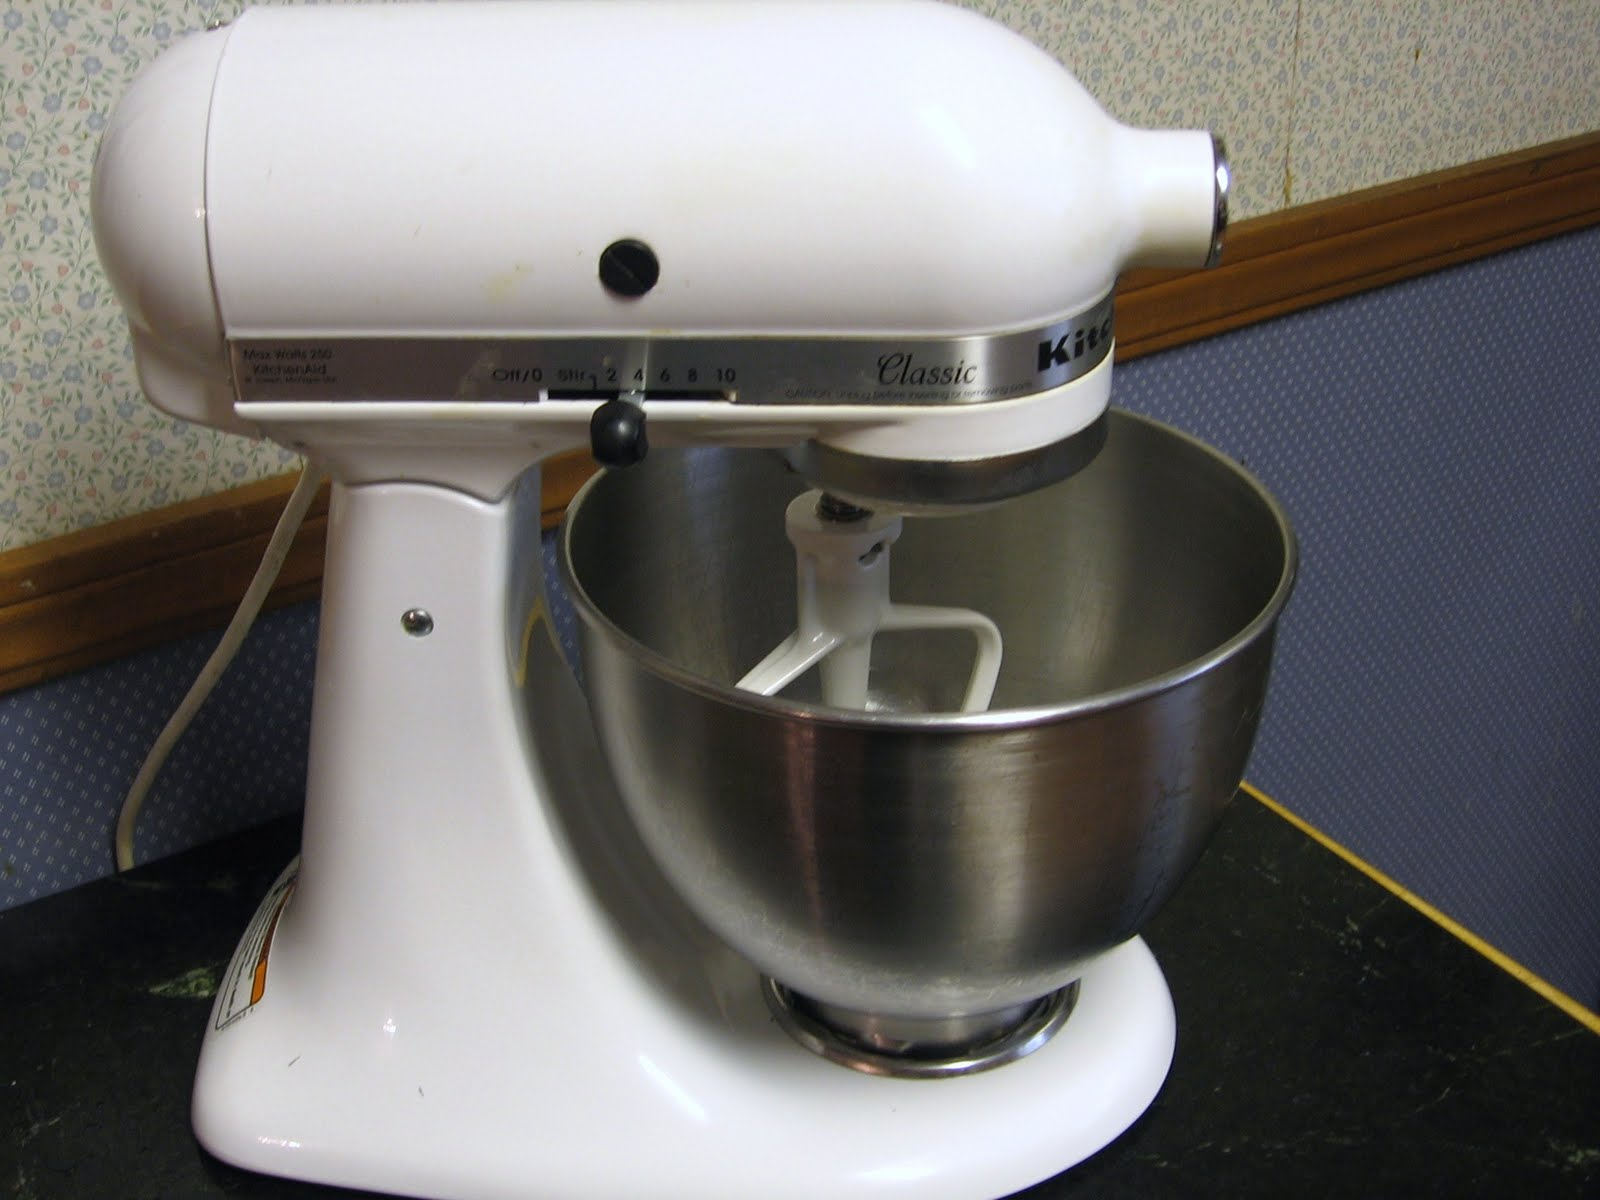 100 kitchenaid mixer classic kitchenaid standmixer classic diamond weiss jpg kitchen burgundy. Black Bedroom Furniture Sets. Home Design Ideas